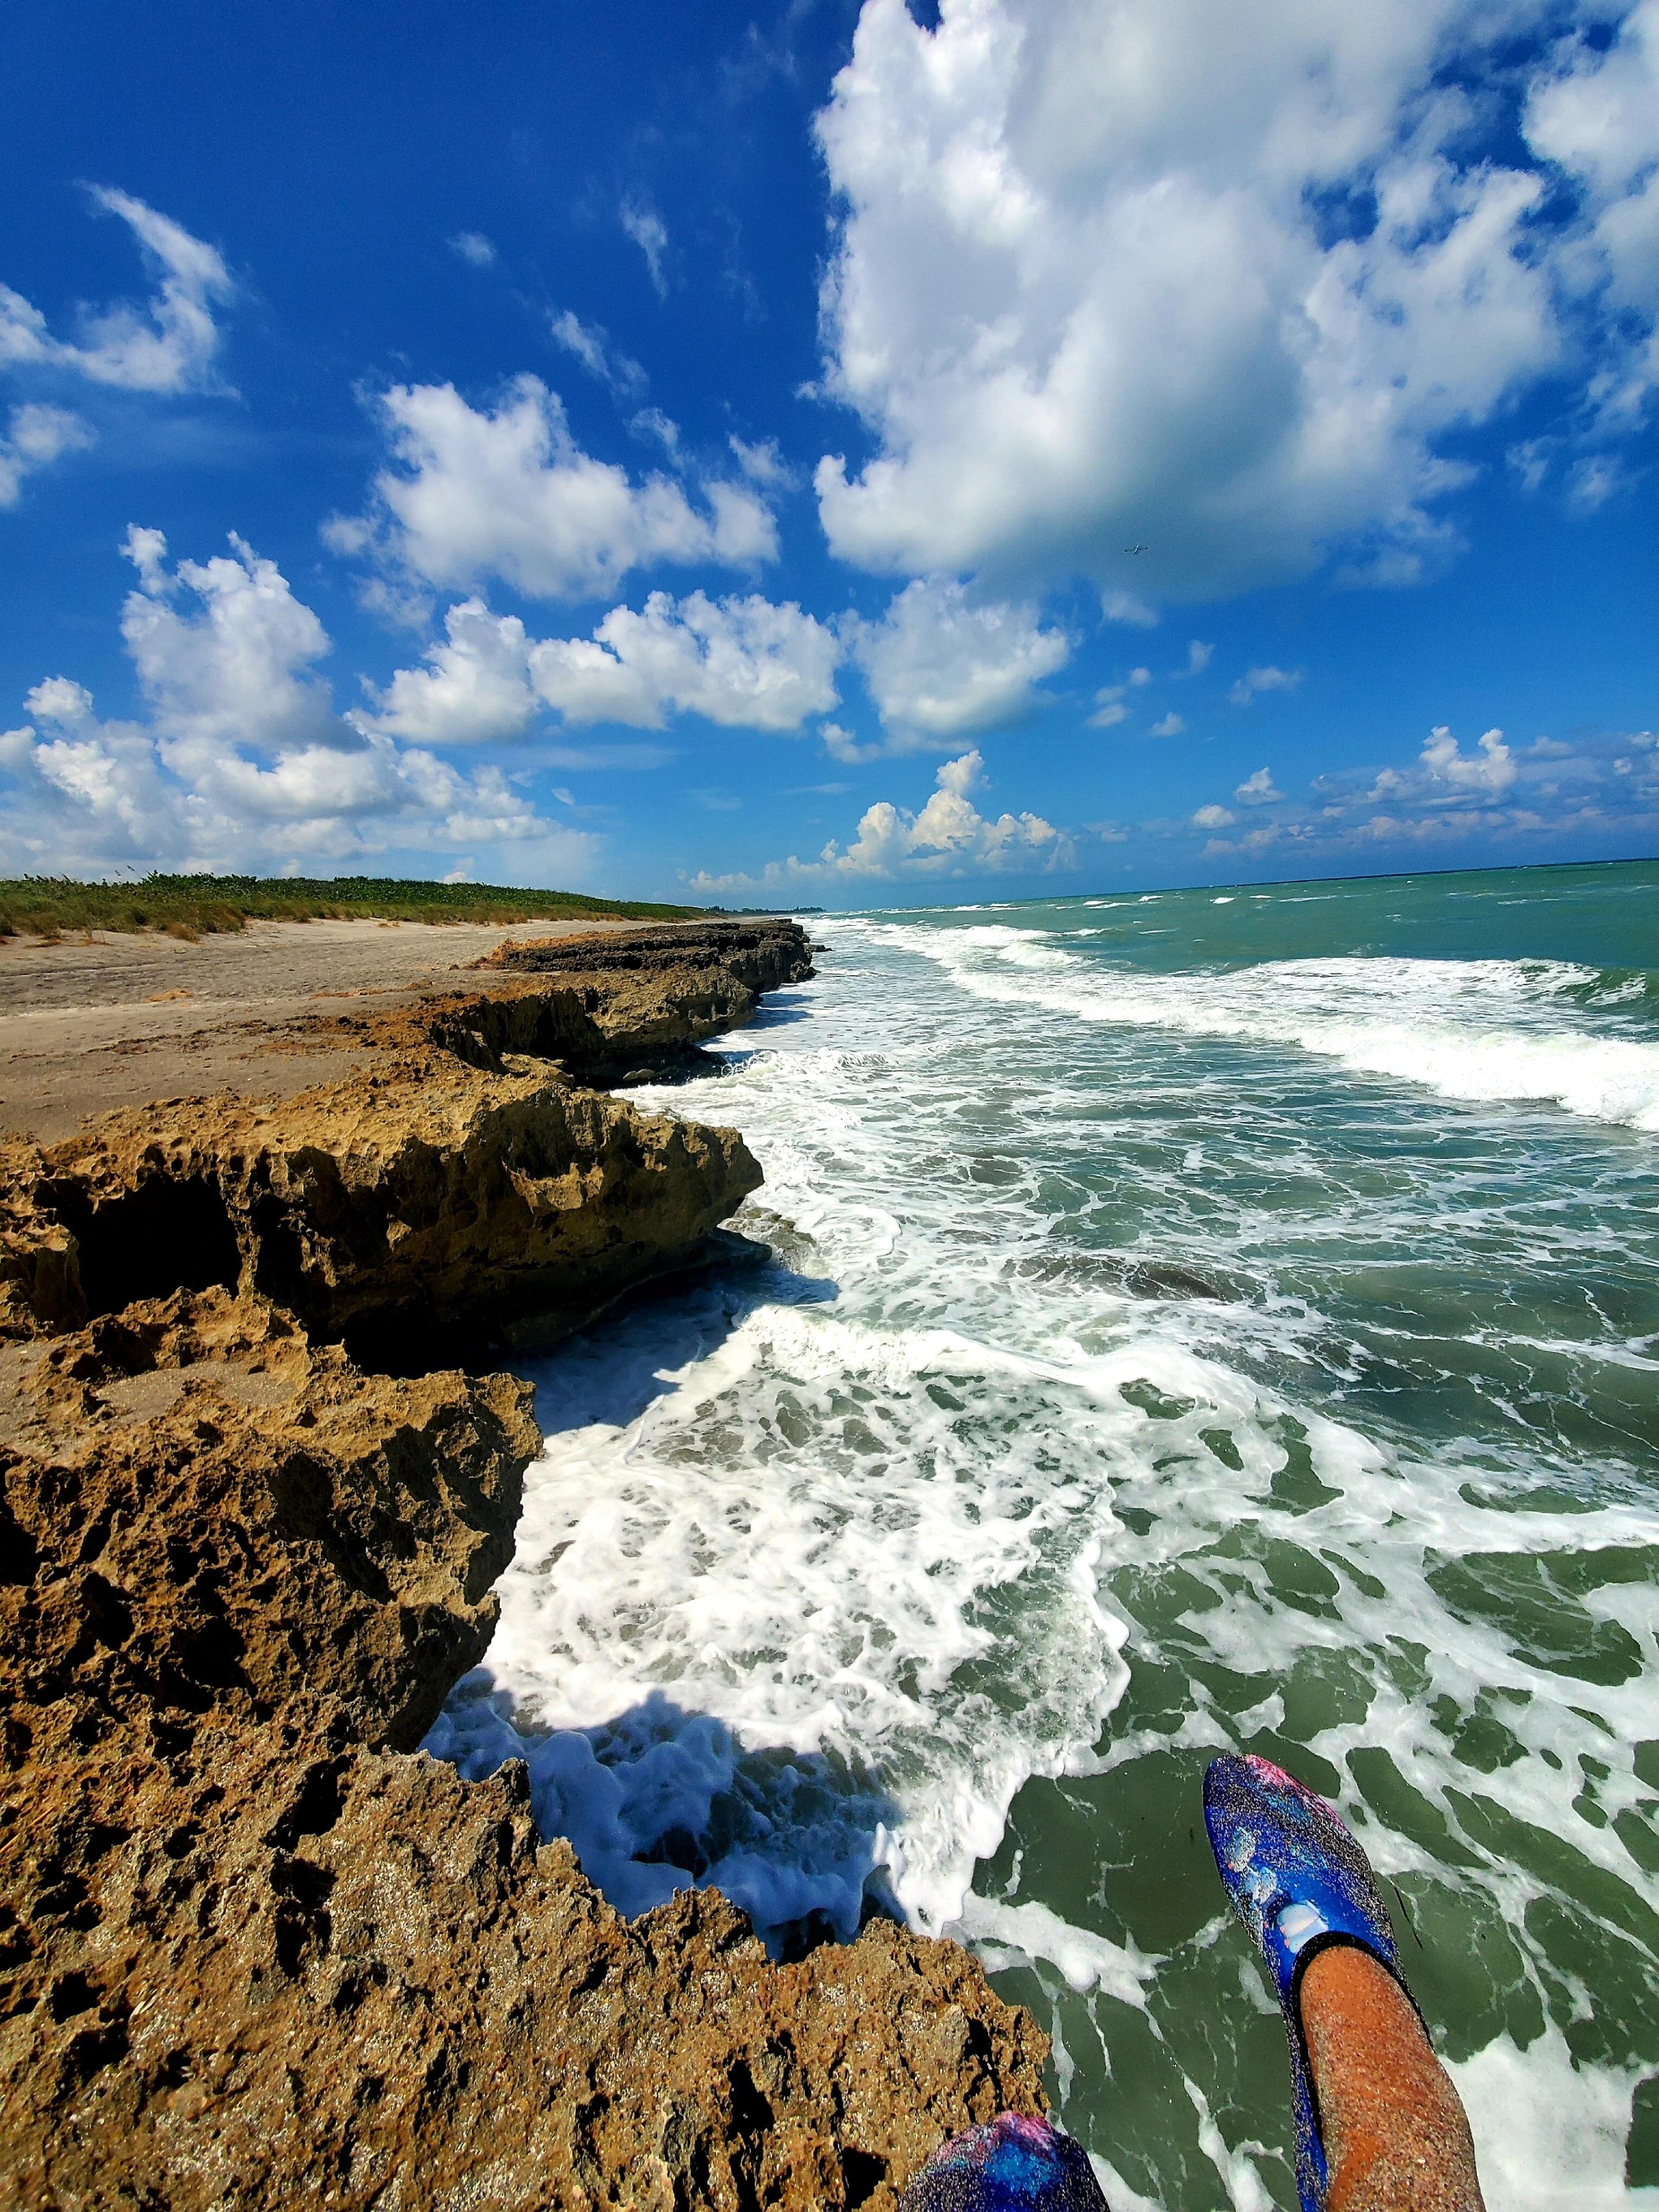 Jupiter Island, Florida, United States of America